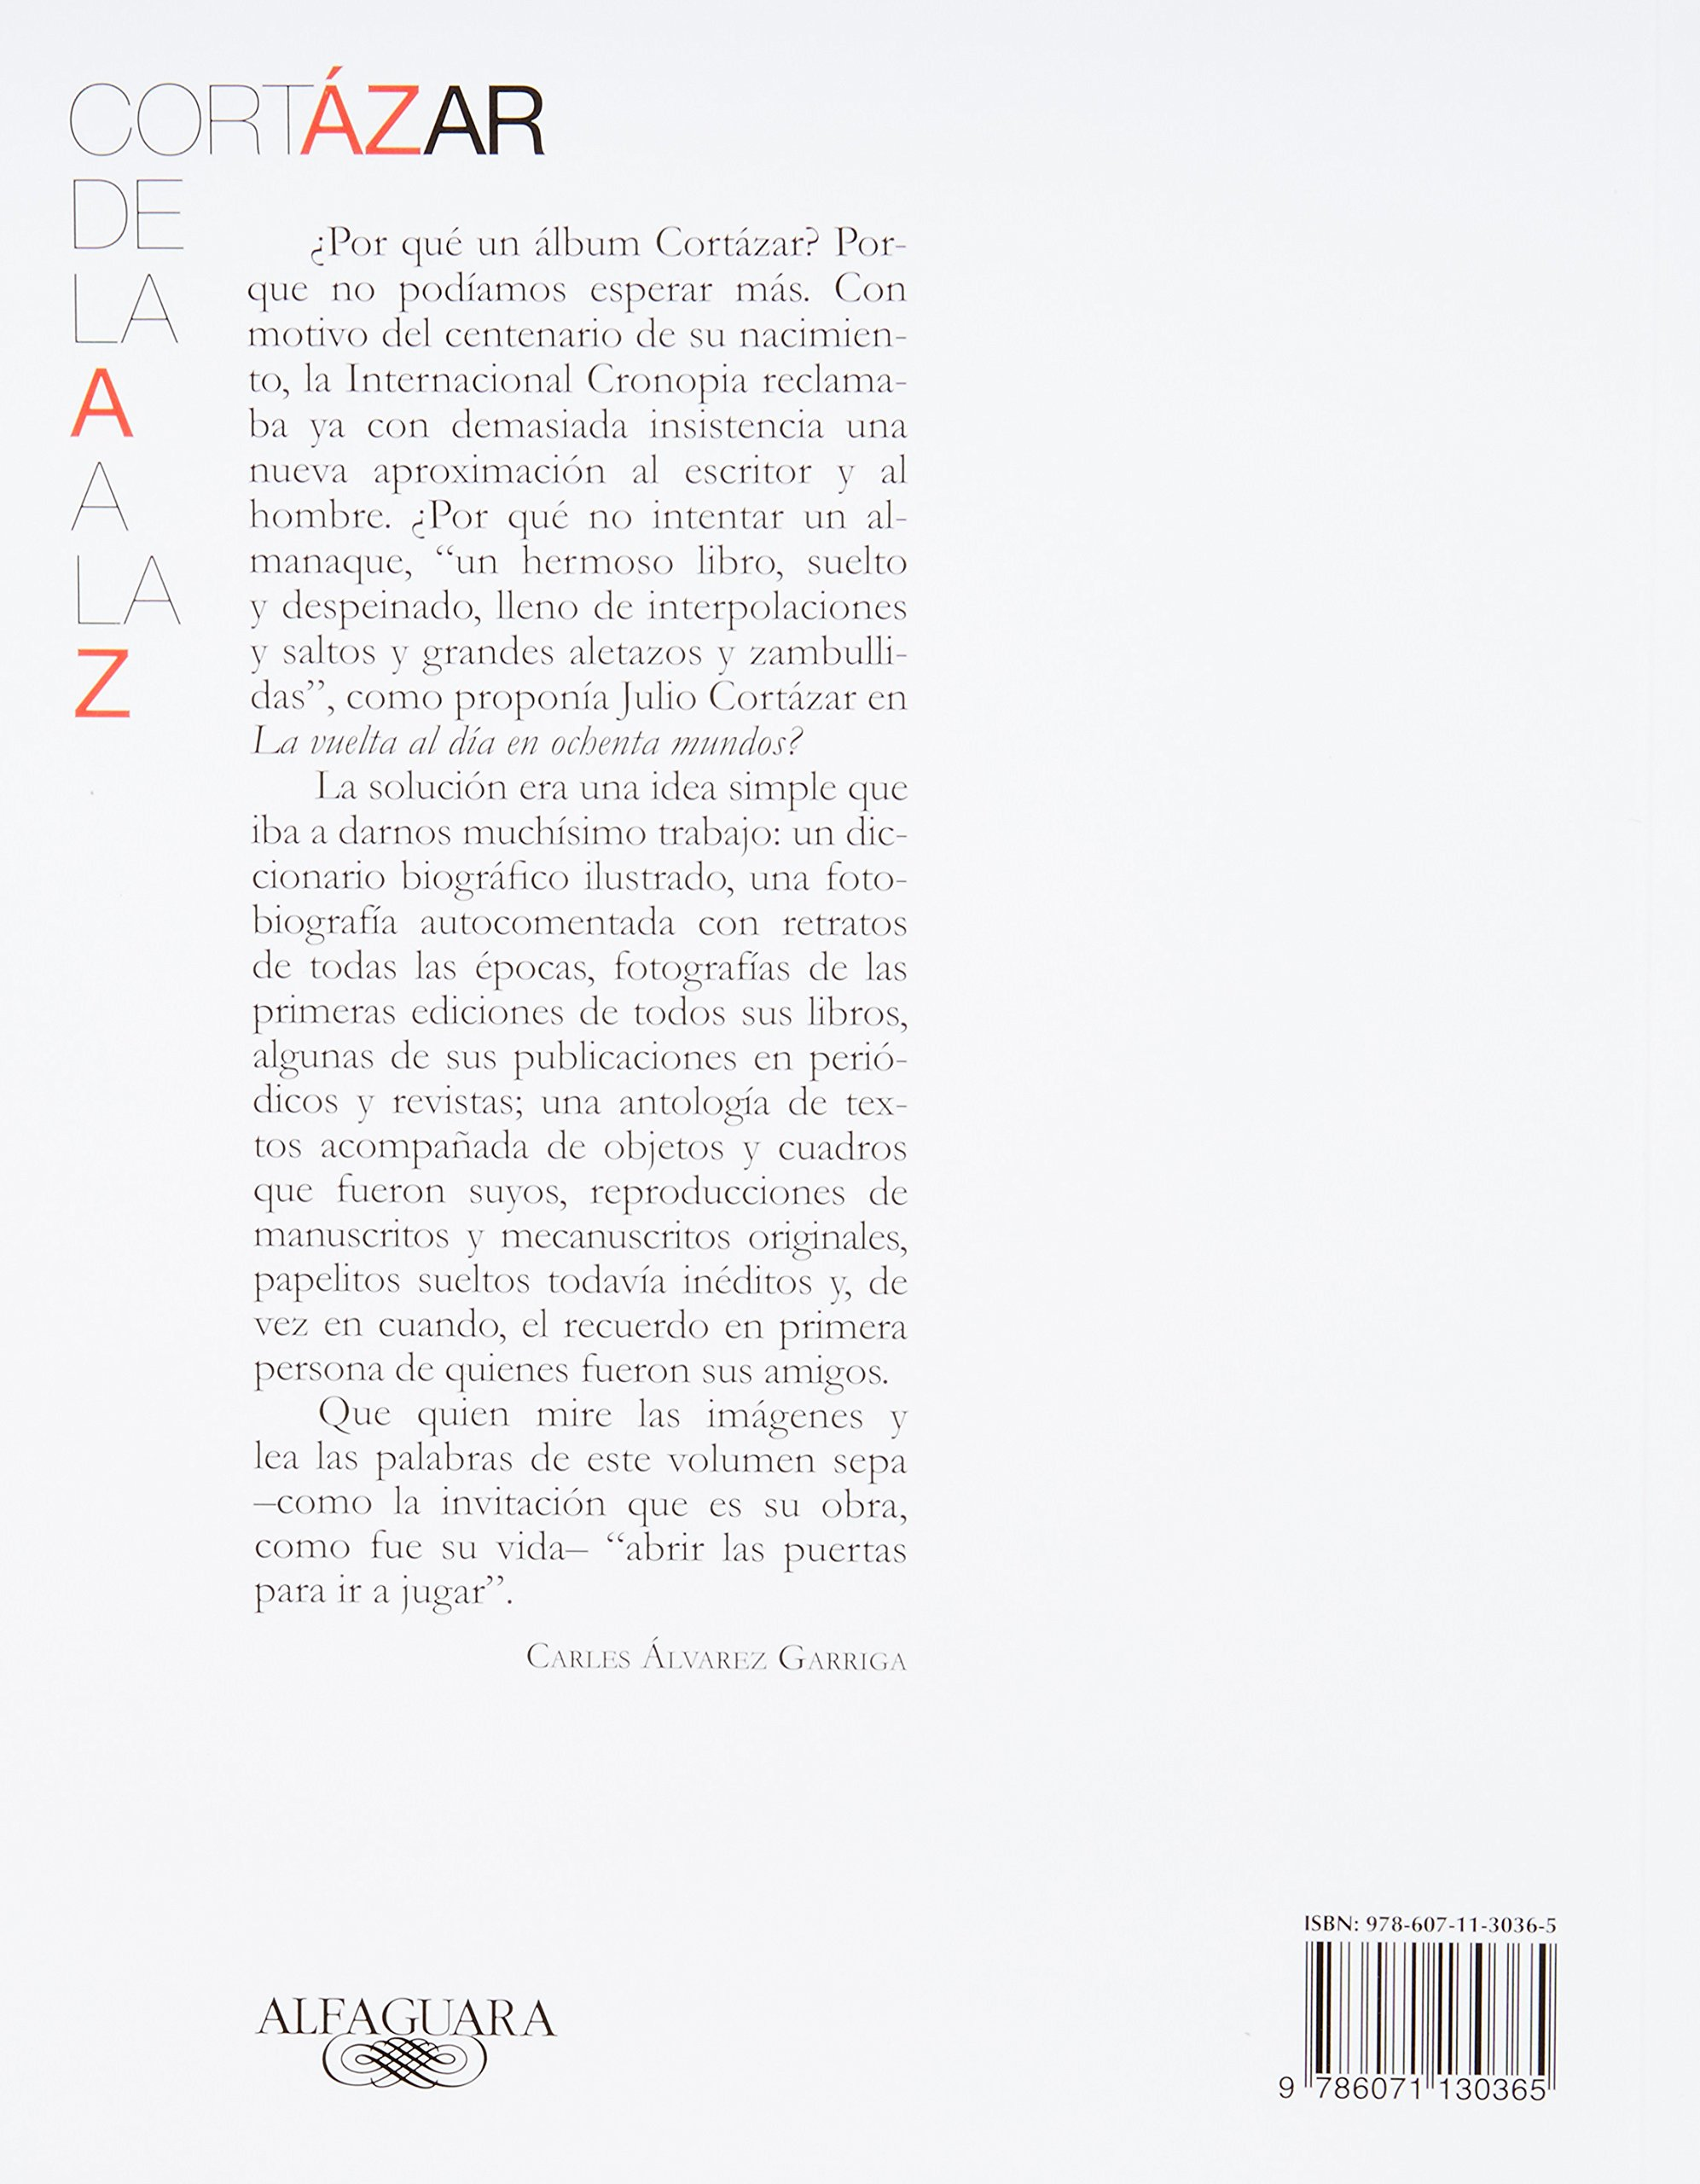 Cortzar de la a a la z spanish edition julio cortazar cortzar de la a a la z spanish edition julio cortazar 9786071130365 amazon books fandeluxe Images